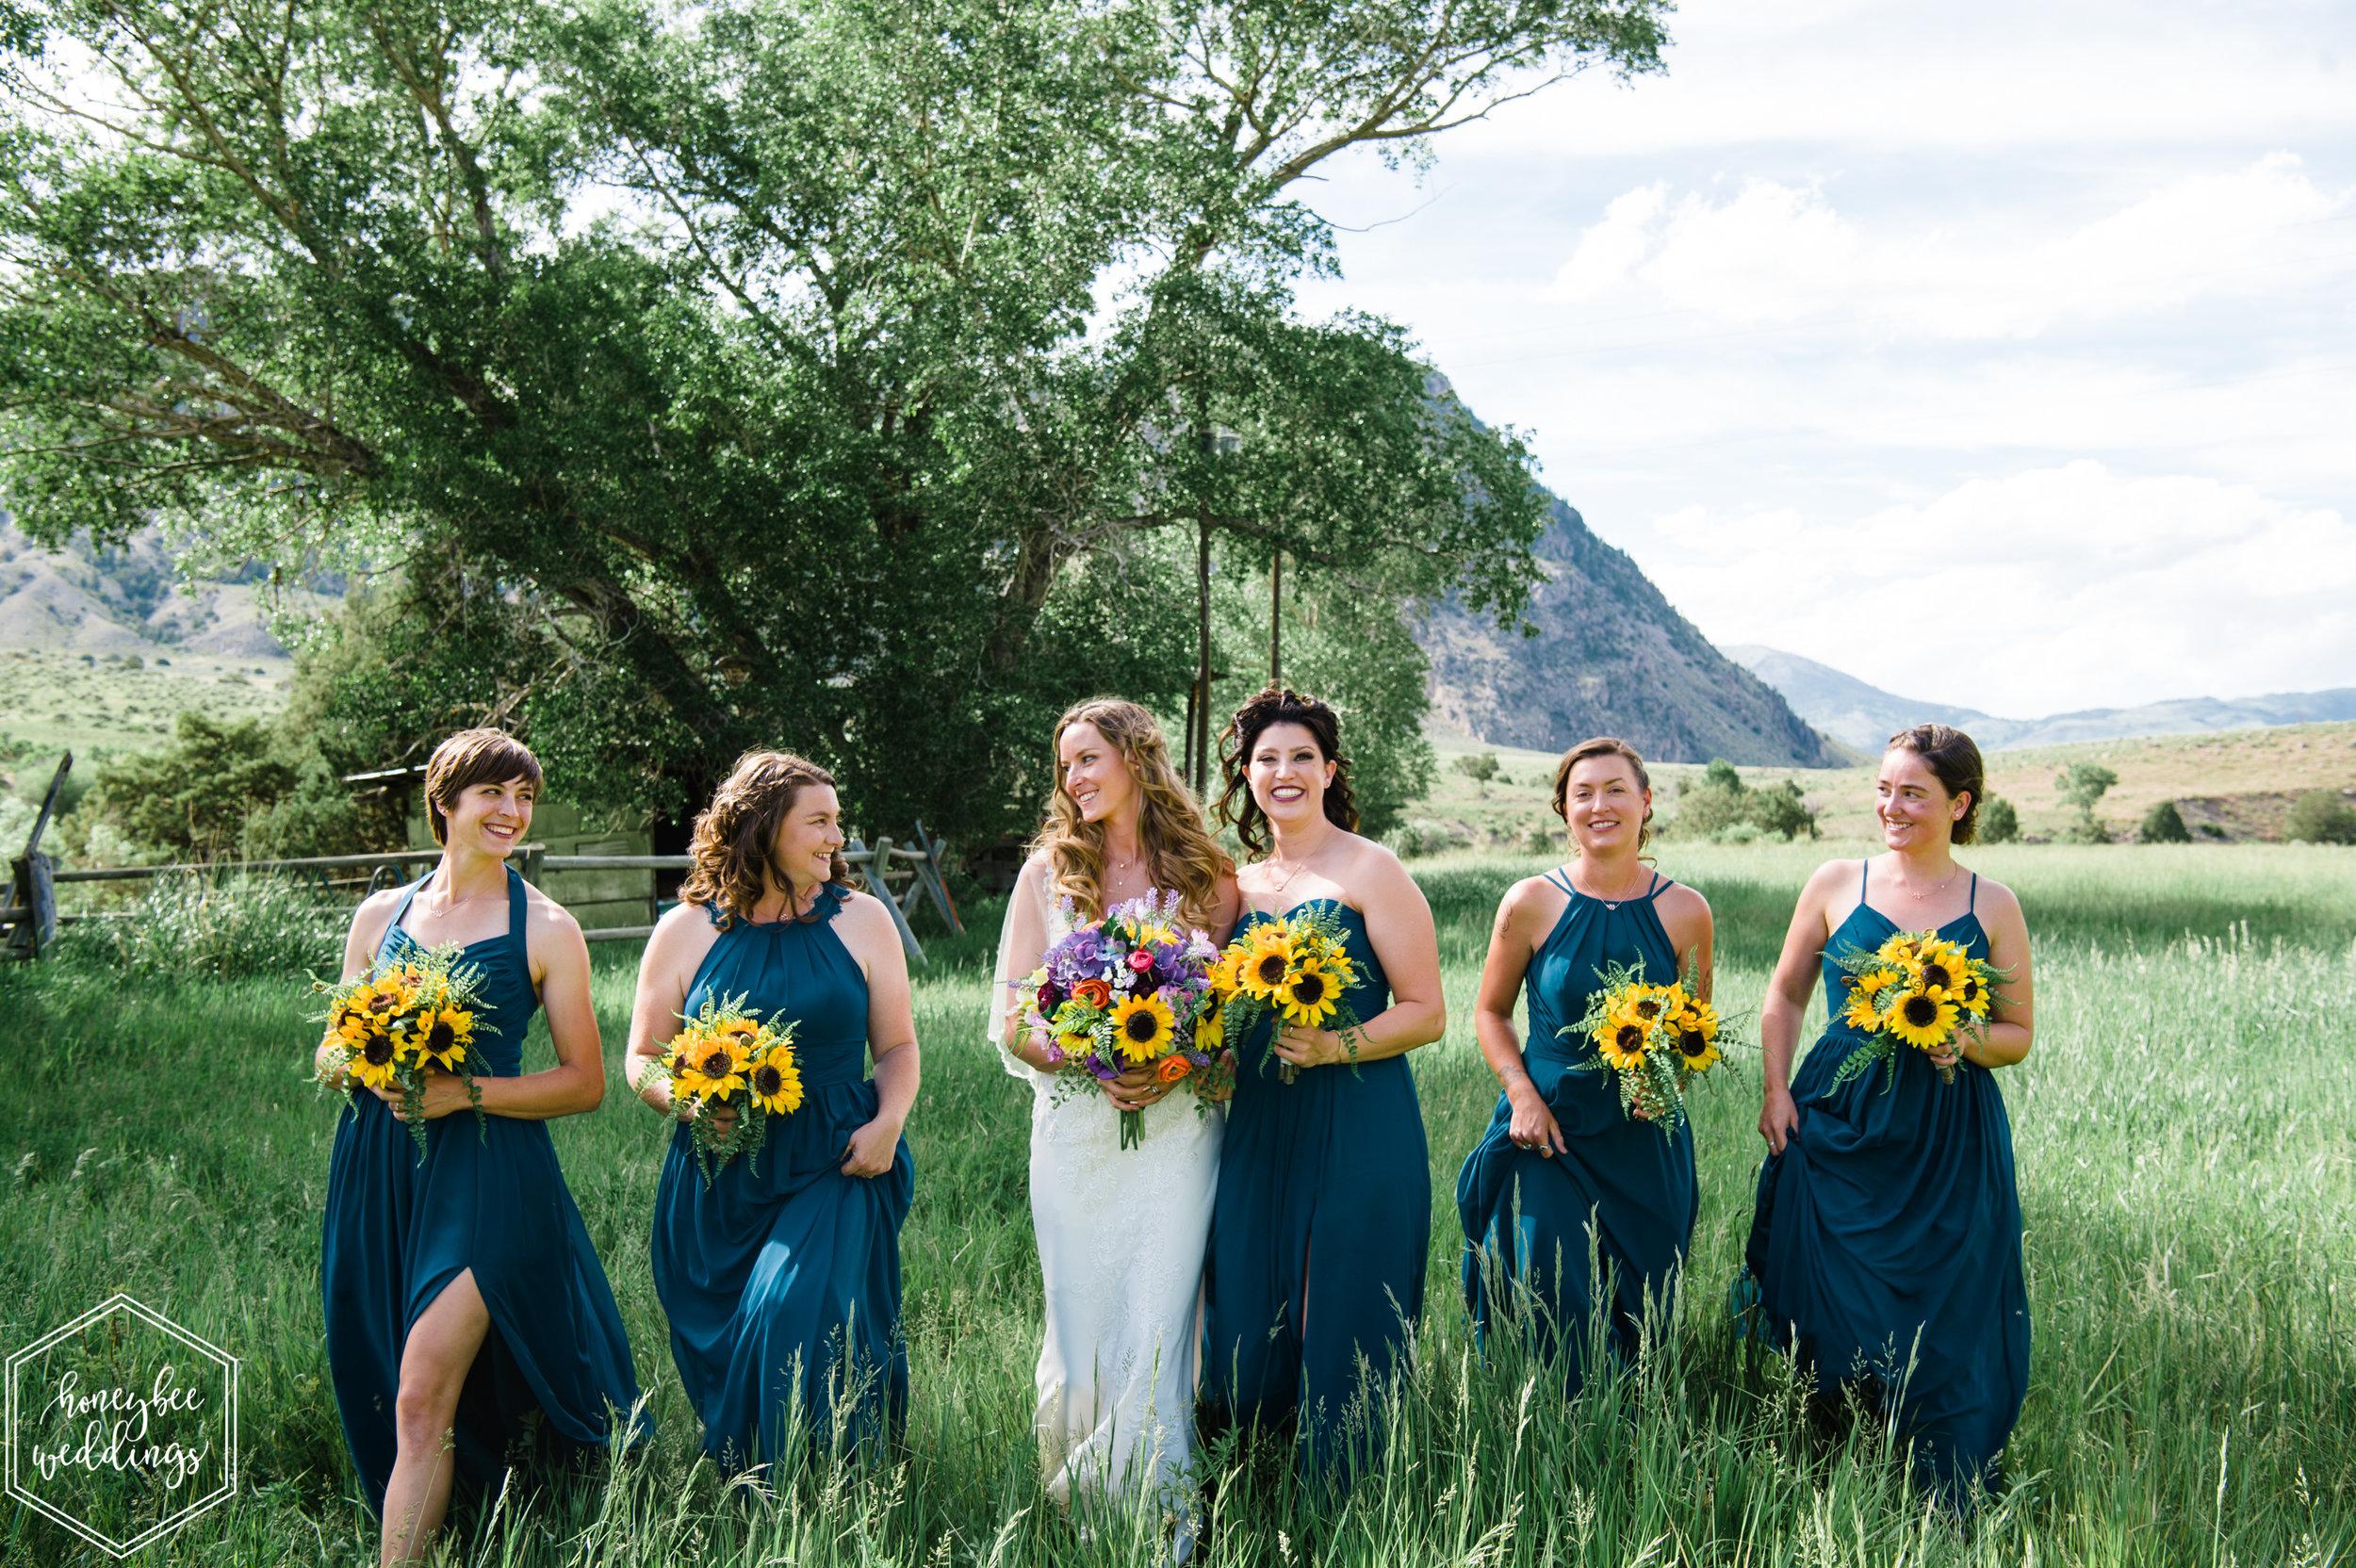 098Yellowstone National Park Wedding_Montana Wedding Photographer_Honeybee Weddings_Shannon & Jonathan_June 29, 2019-550.jpg